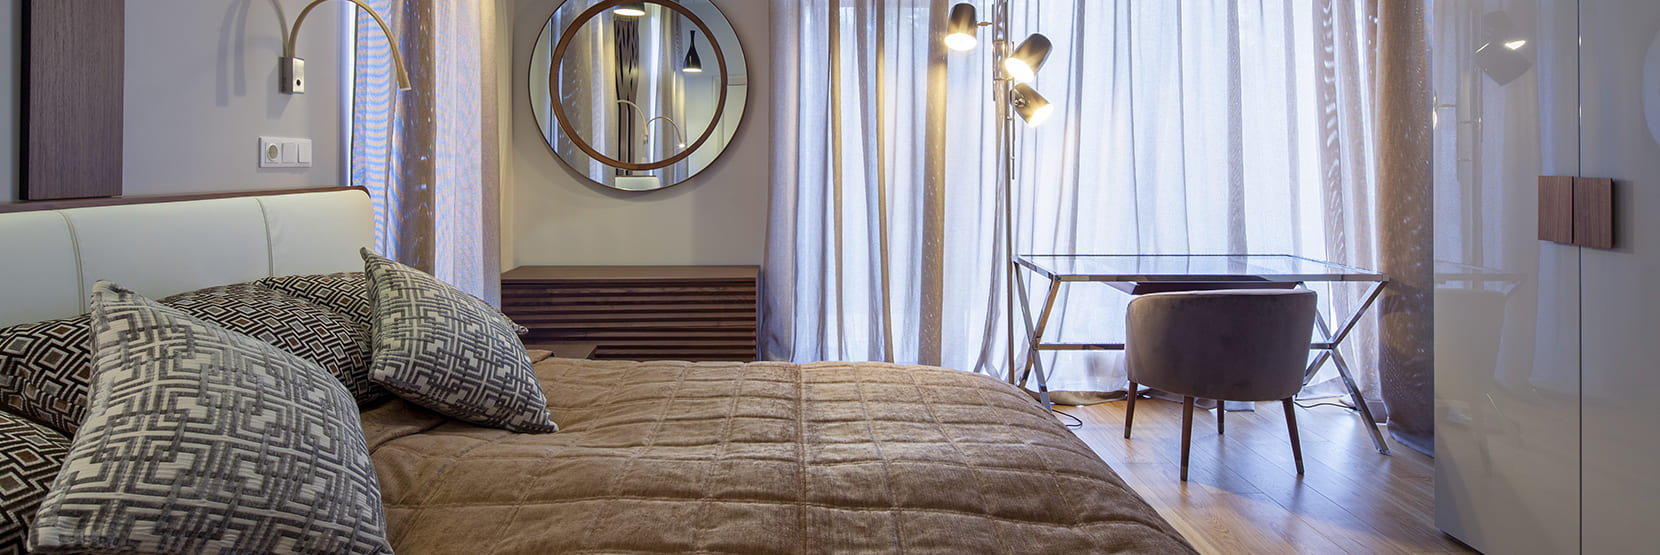 Ideale luchtvochtigheid in de slaapkamer